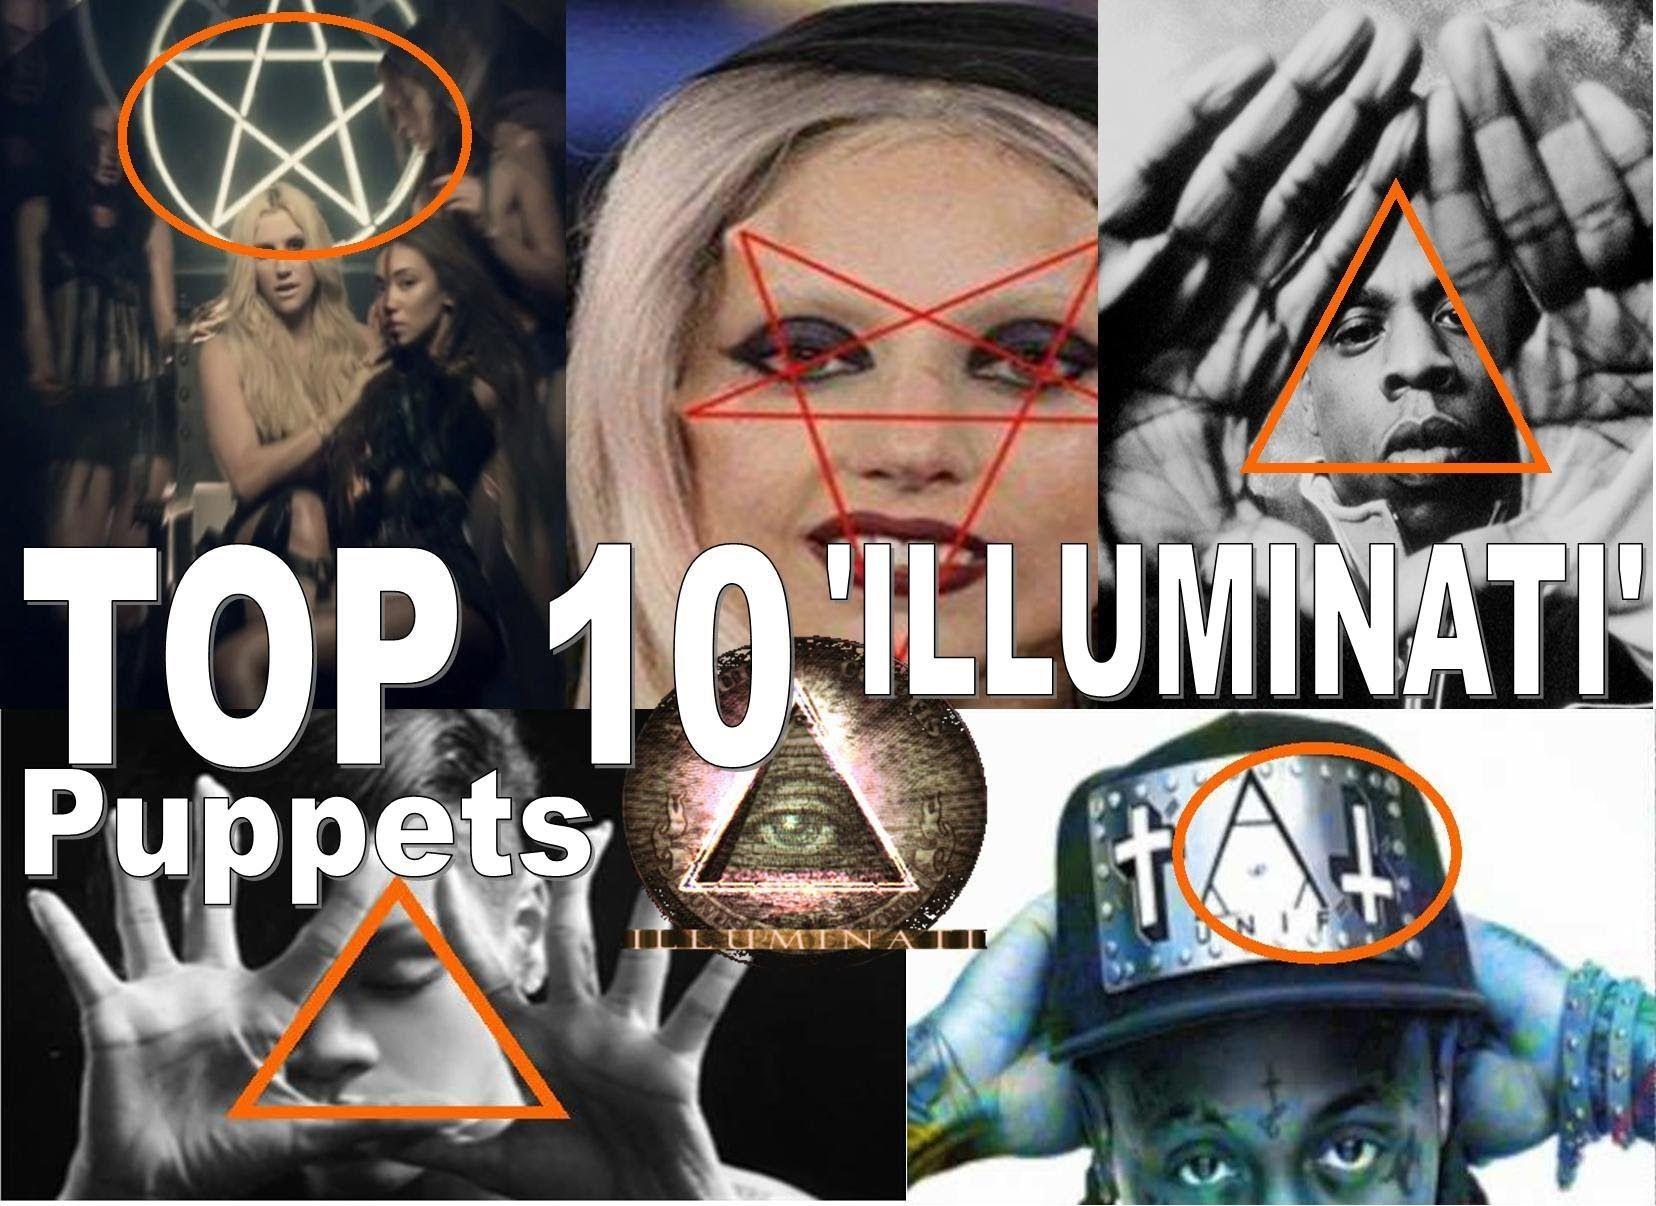 Top 10 illuminati pop puppetscelebrities satanic music top 10 illuminati pop puppetscelebrities satanic music industry biocorpaavc Choice Image